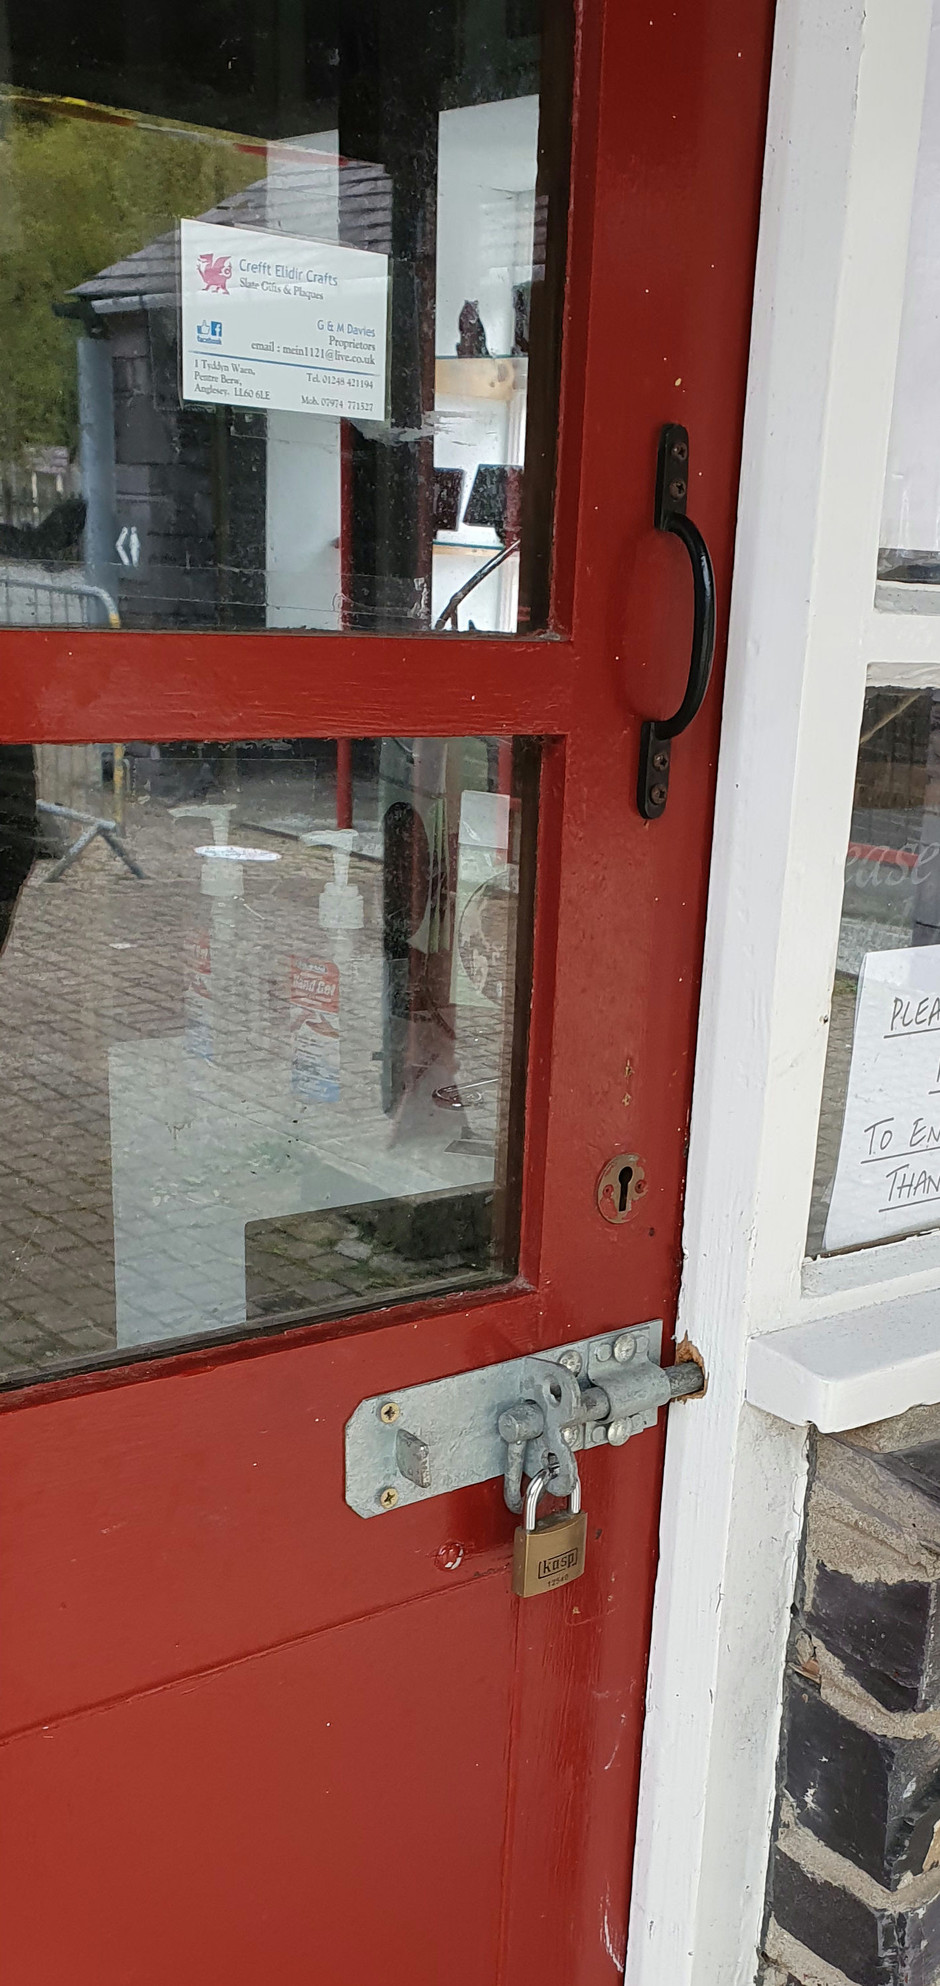 South Shields locksmith service